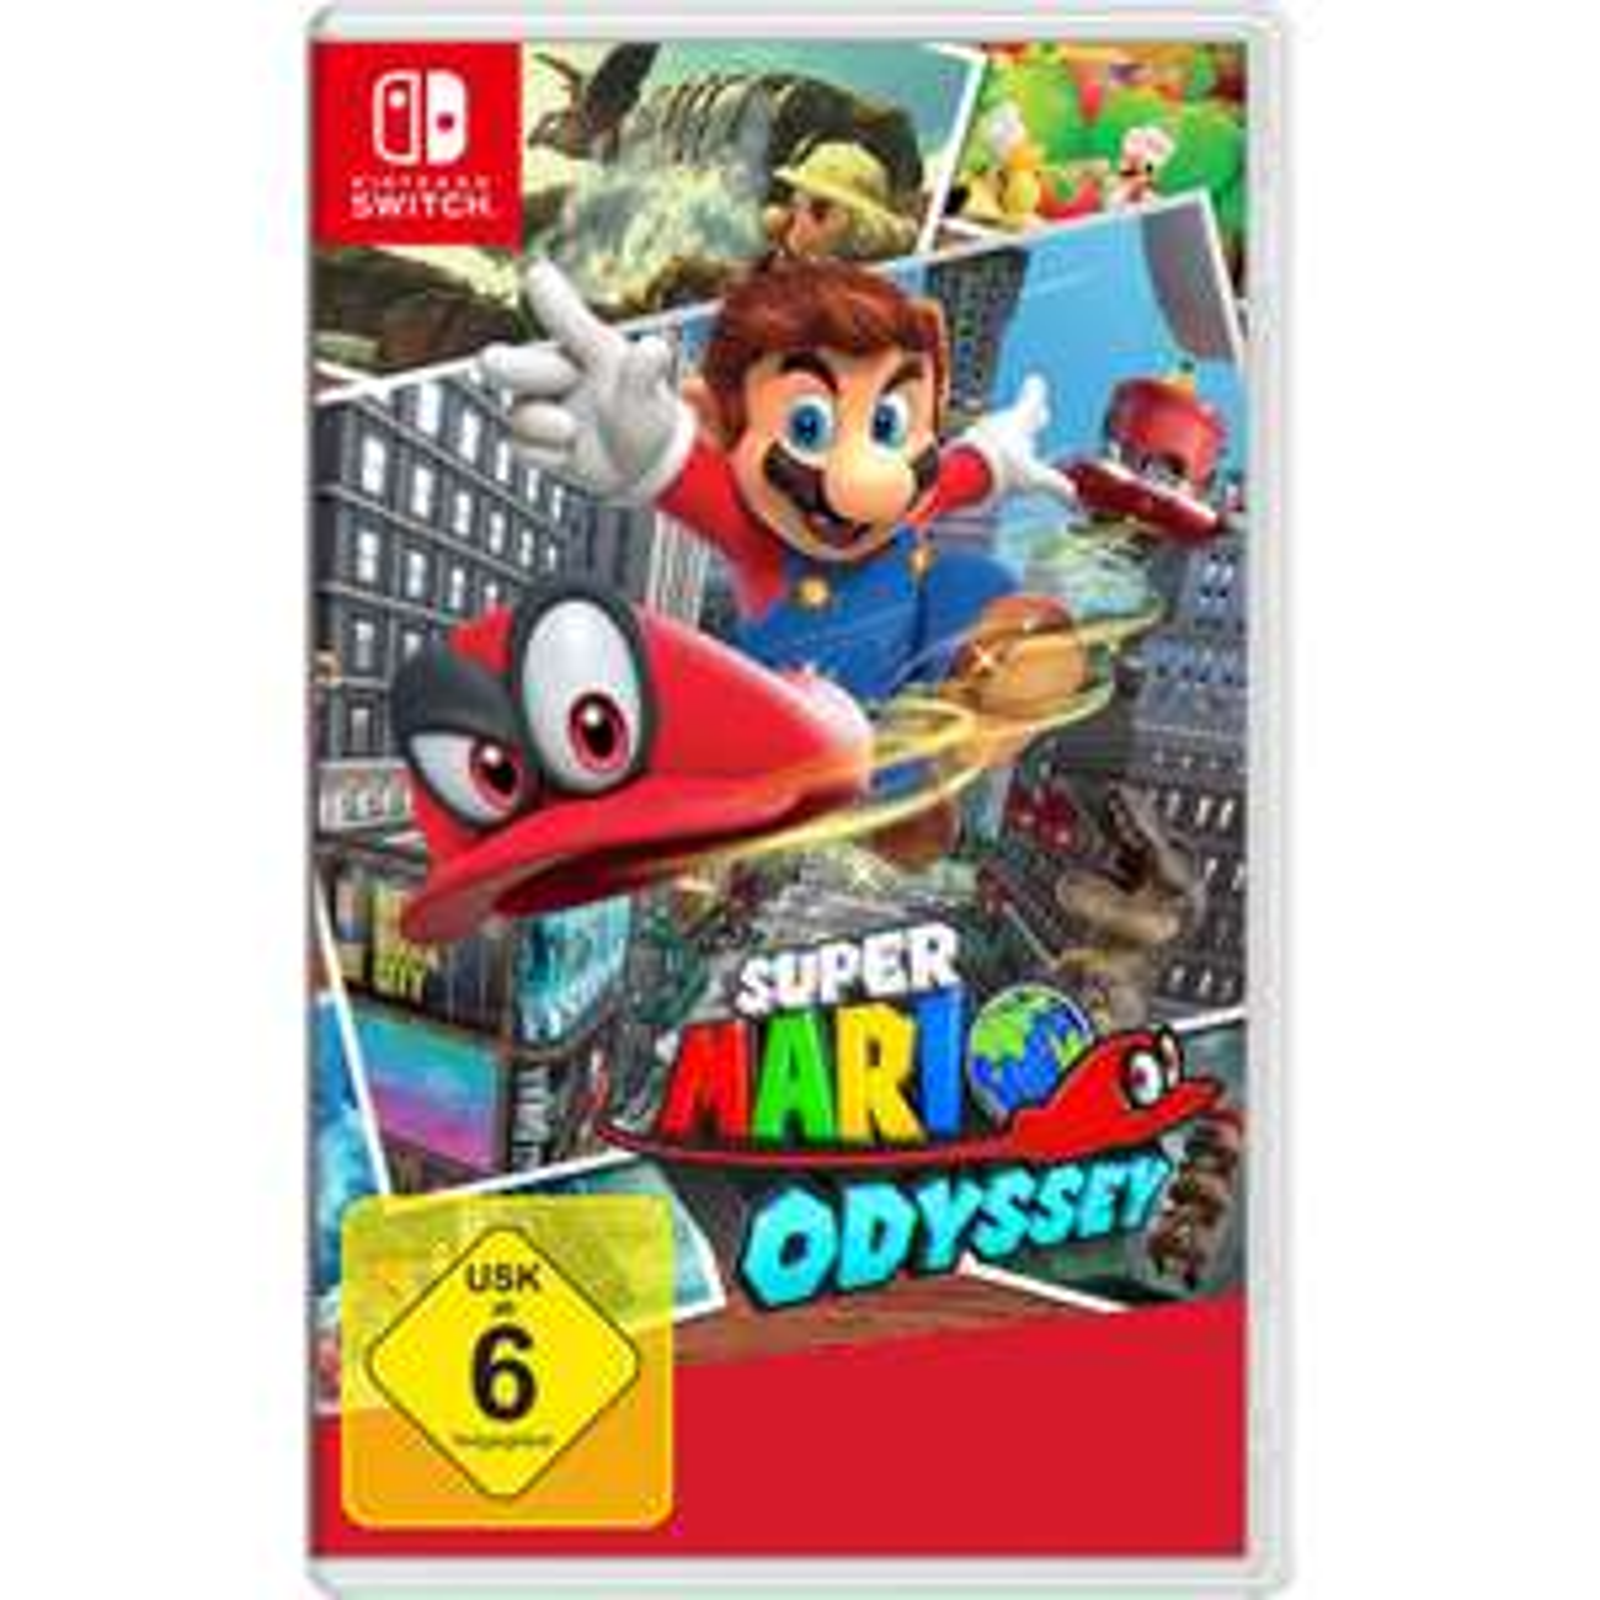 [Media Markt@eBay] Super Mario Odyssey (Nintendo Switch)